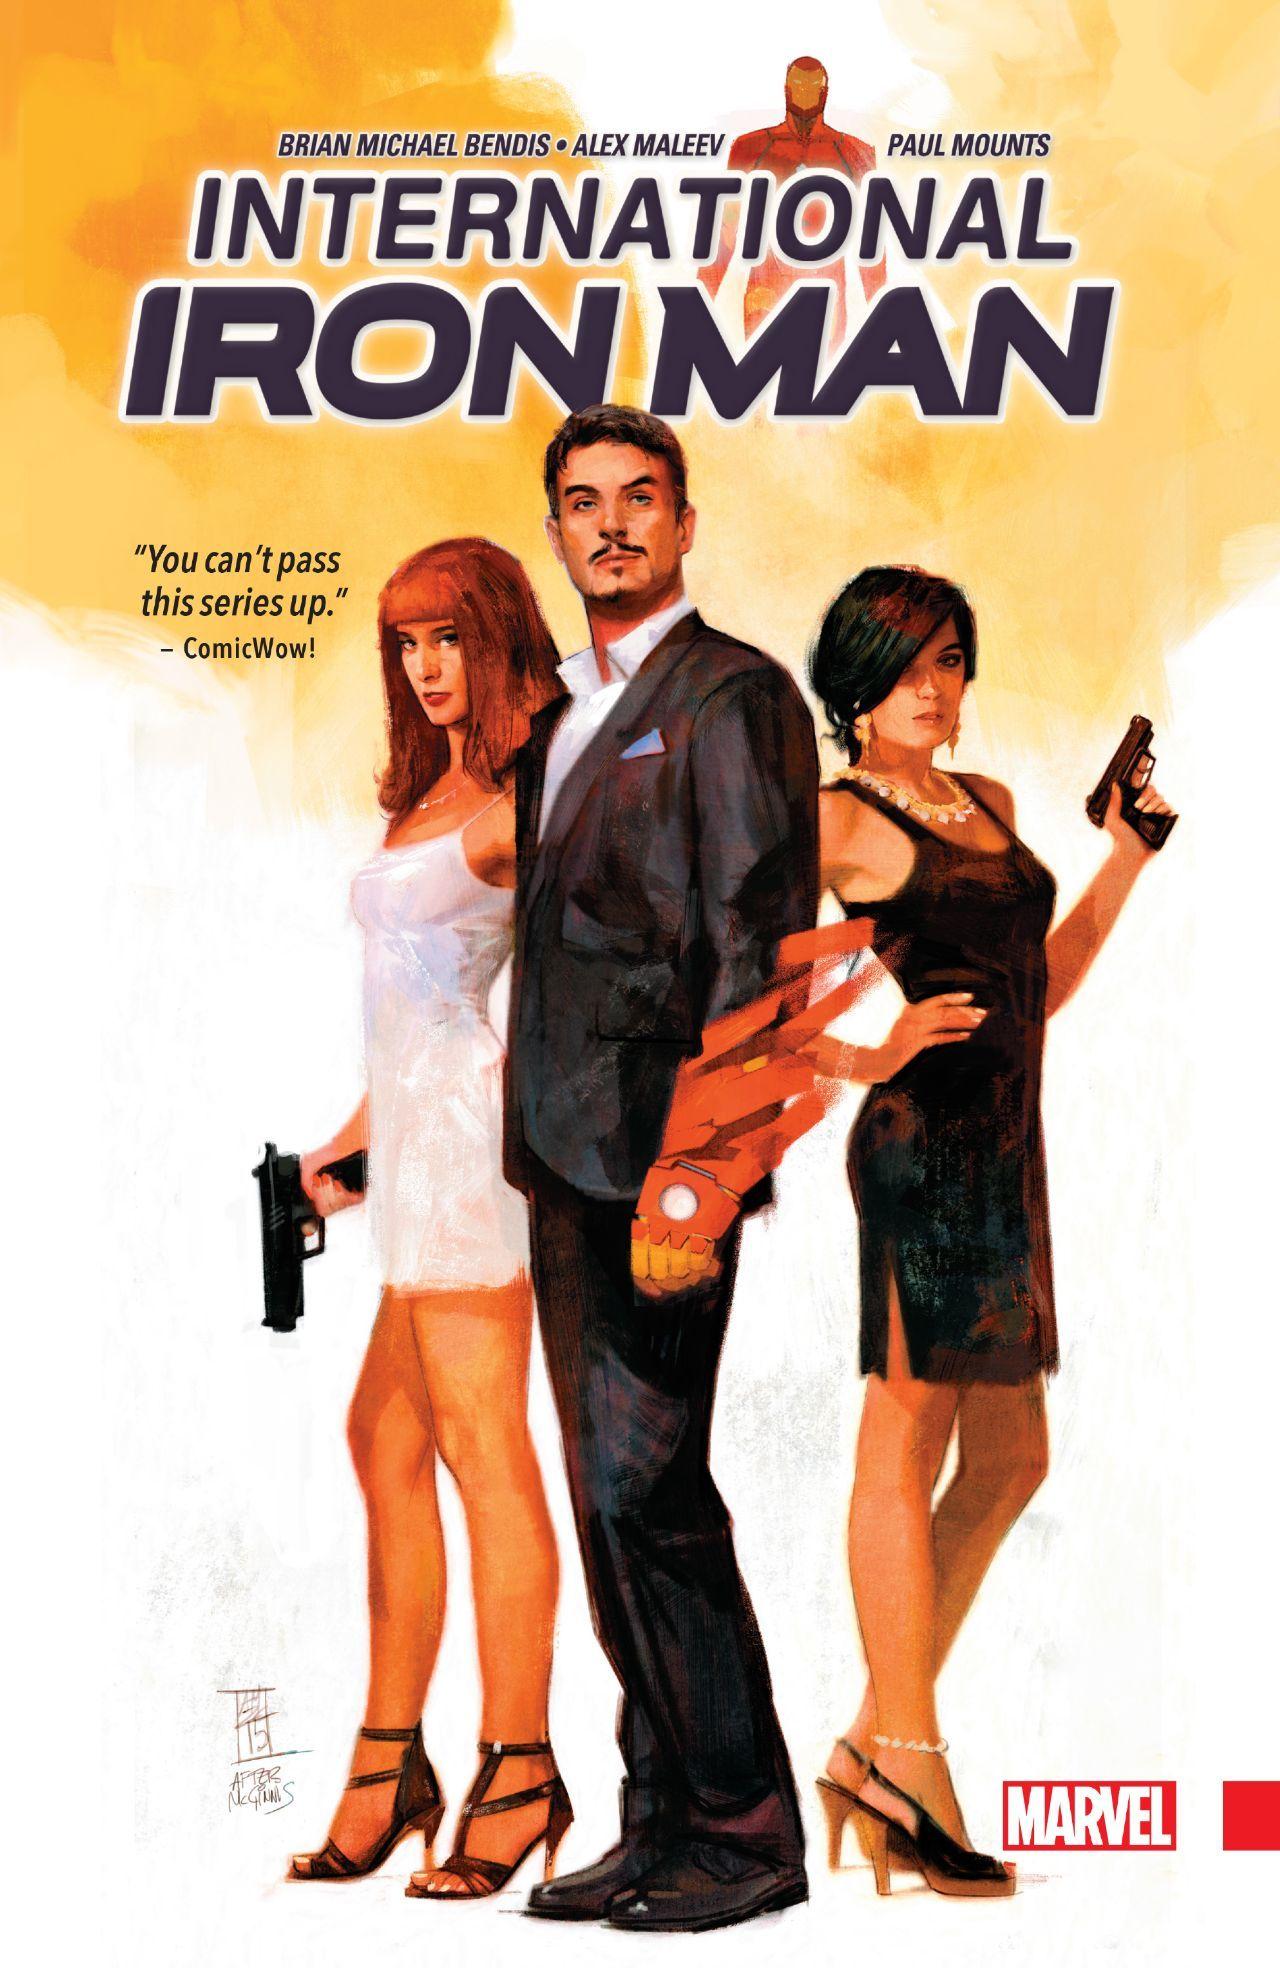 International Iron Man #TPB #Marvel @marvel @marvelofficial #IronMan (Cover Artist: Alex Maleev) Release Date: 10/26/2016